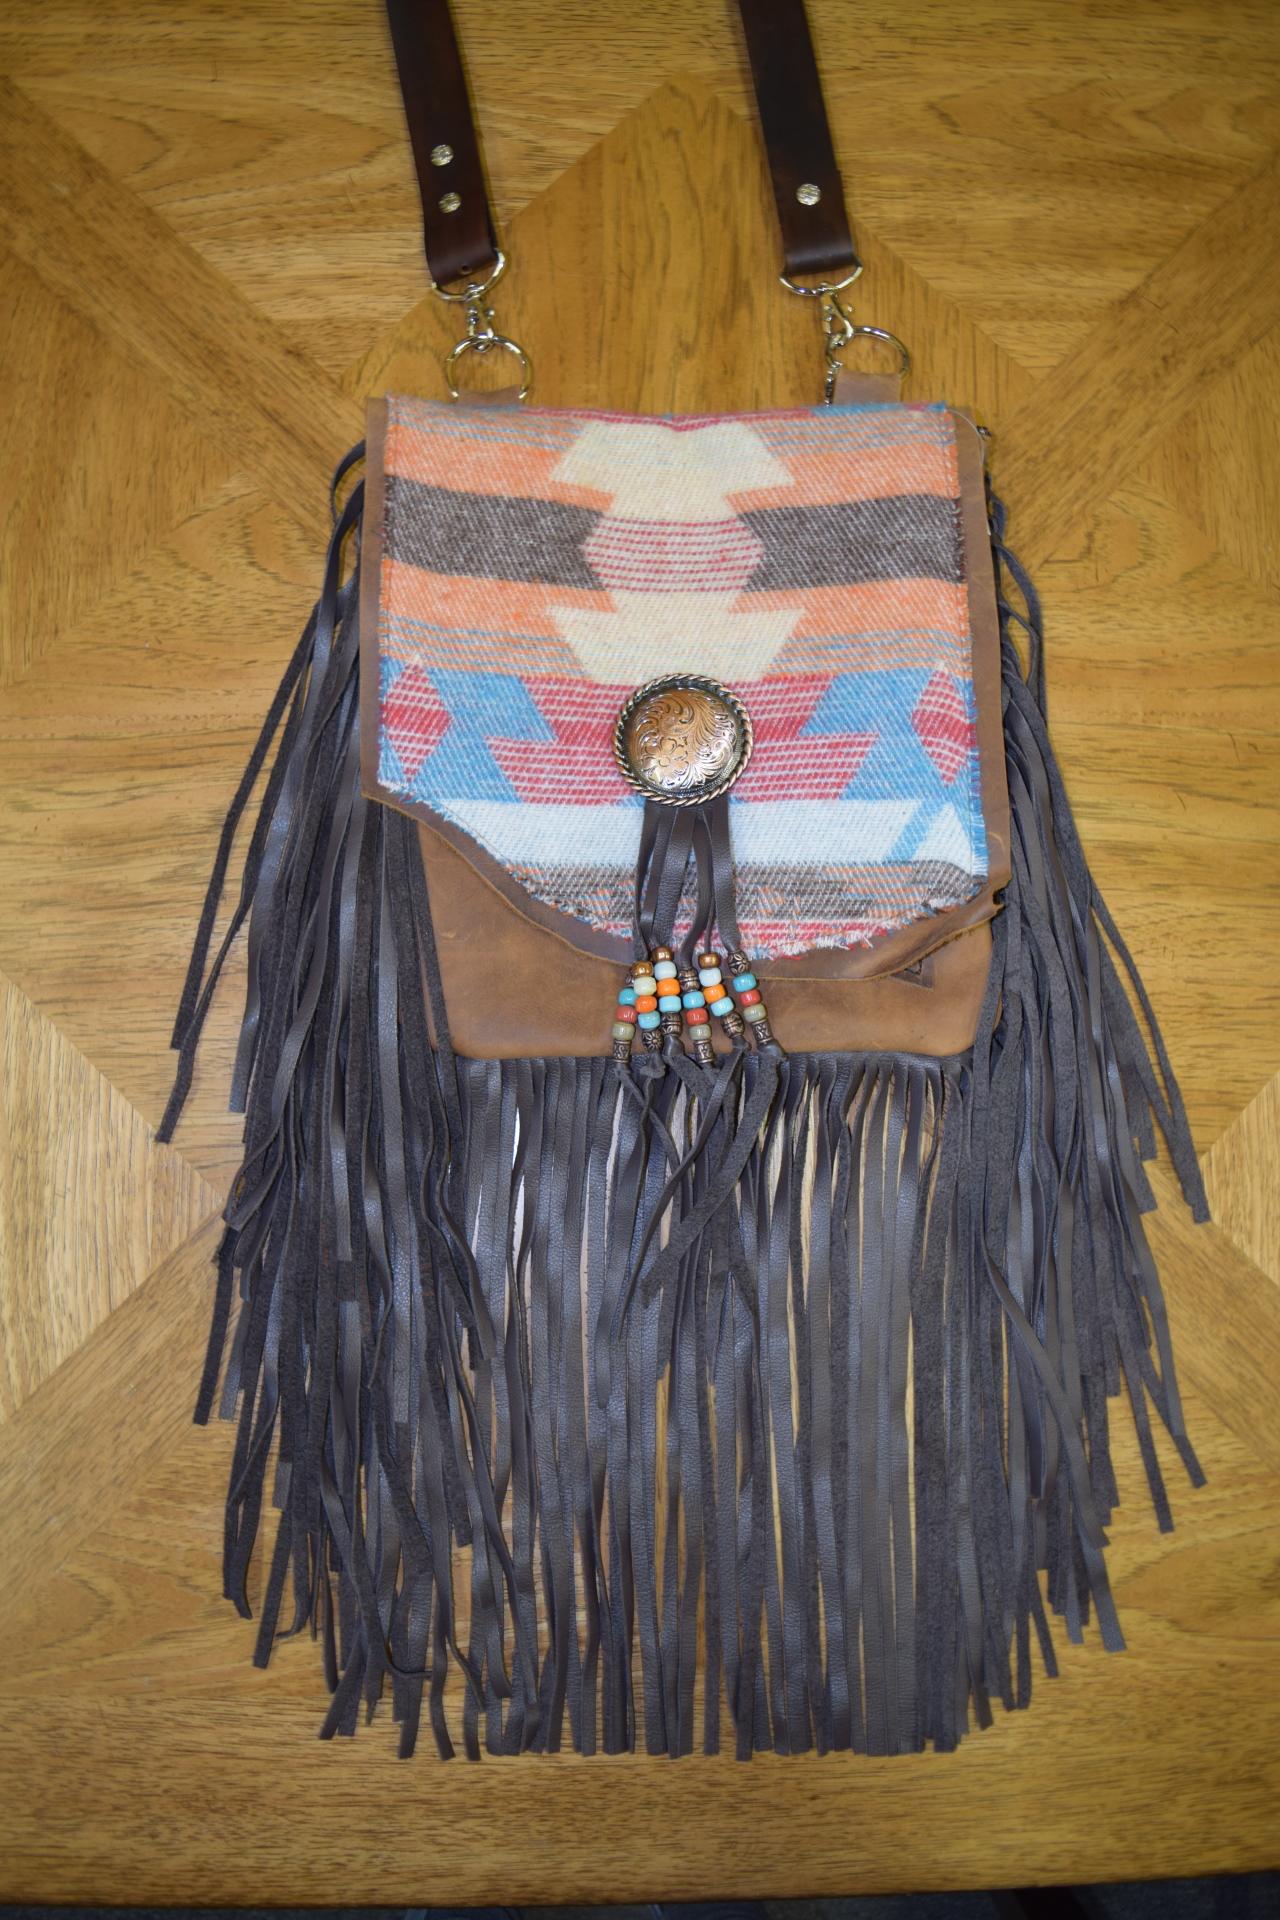 LEATHER SANTA FE FRINGE BAG - $220.00